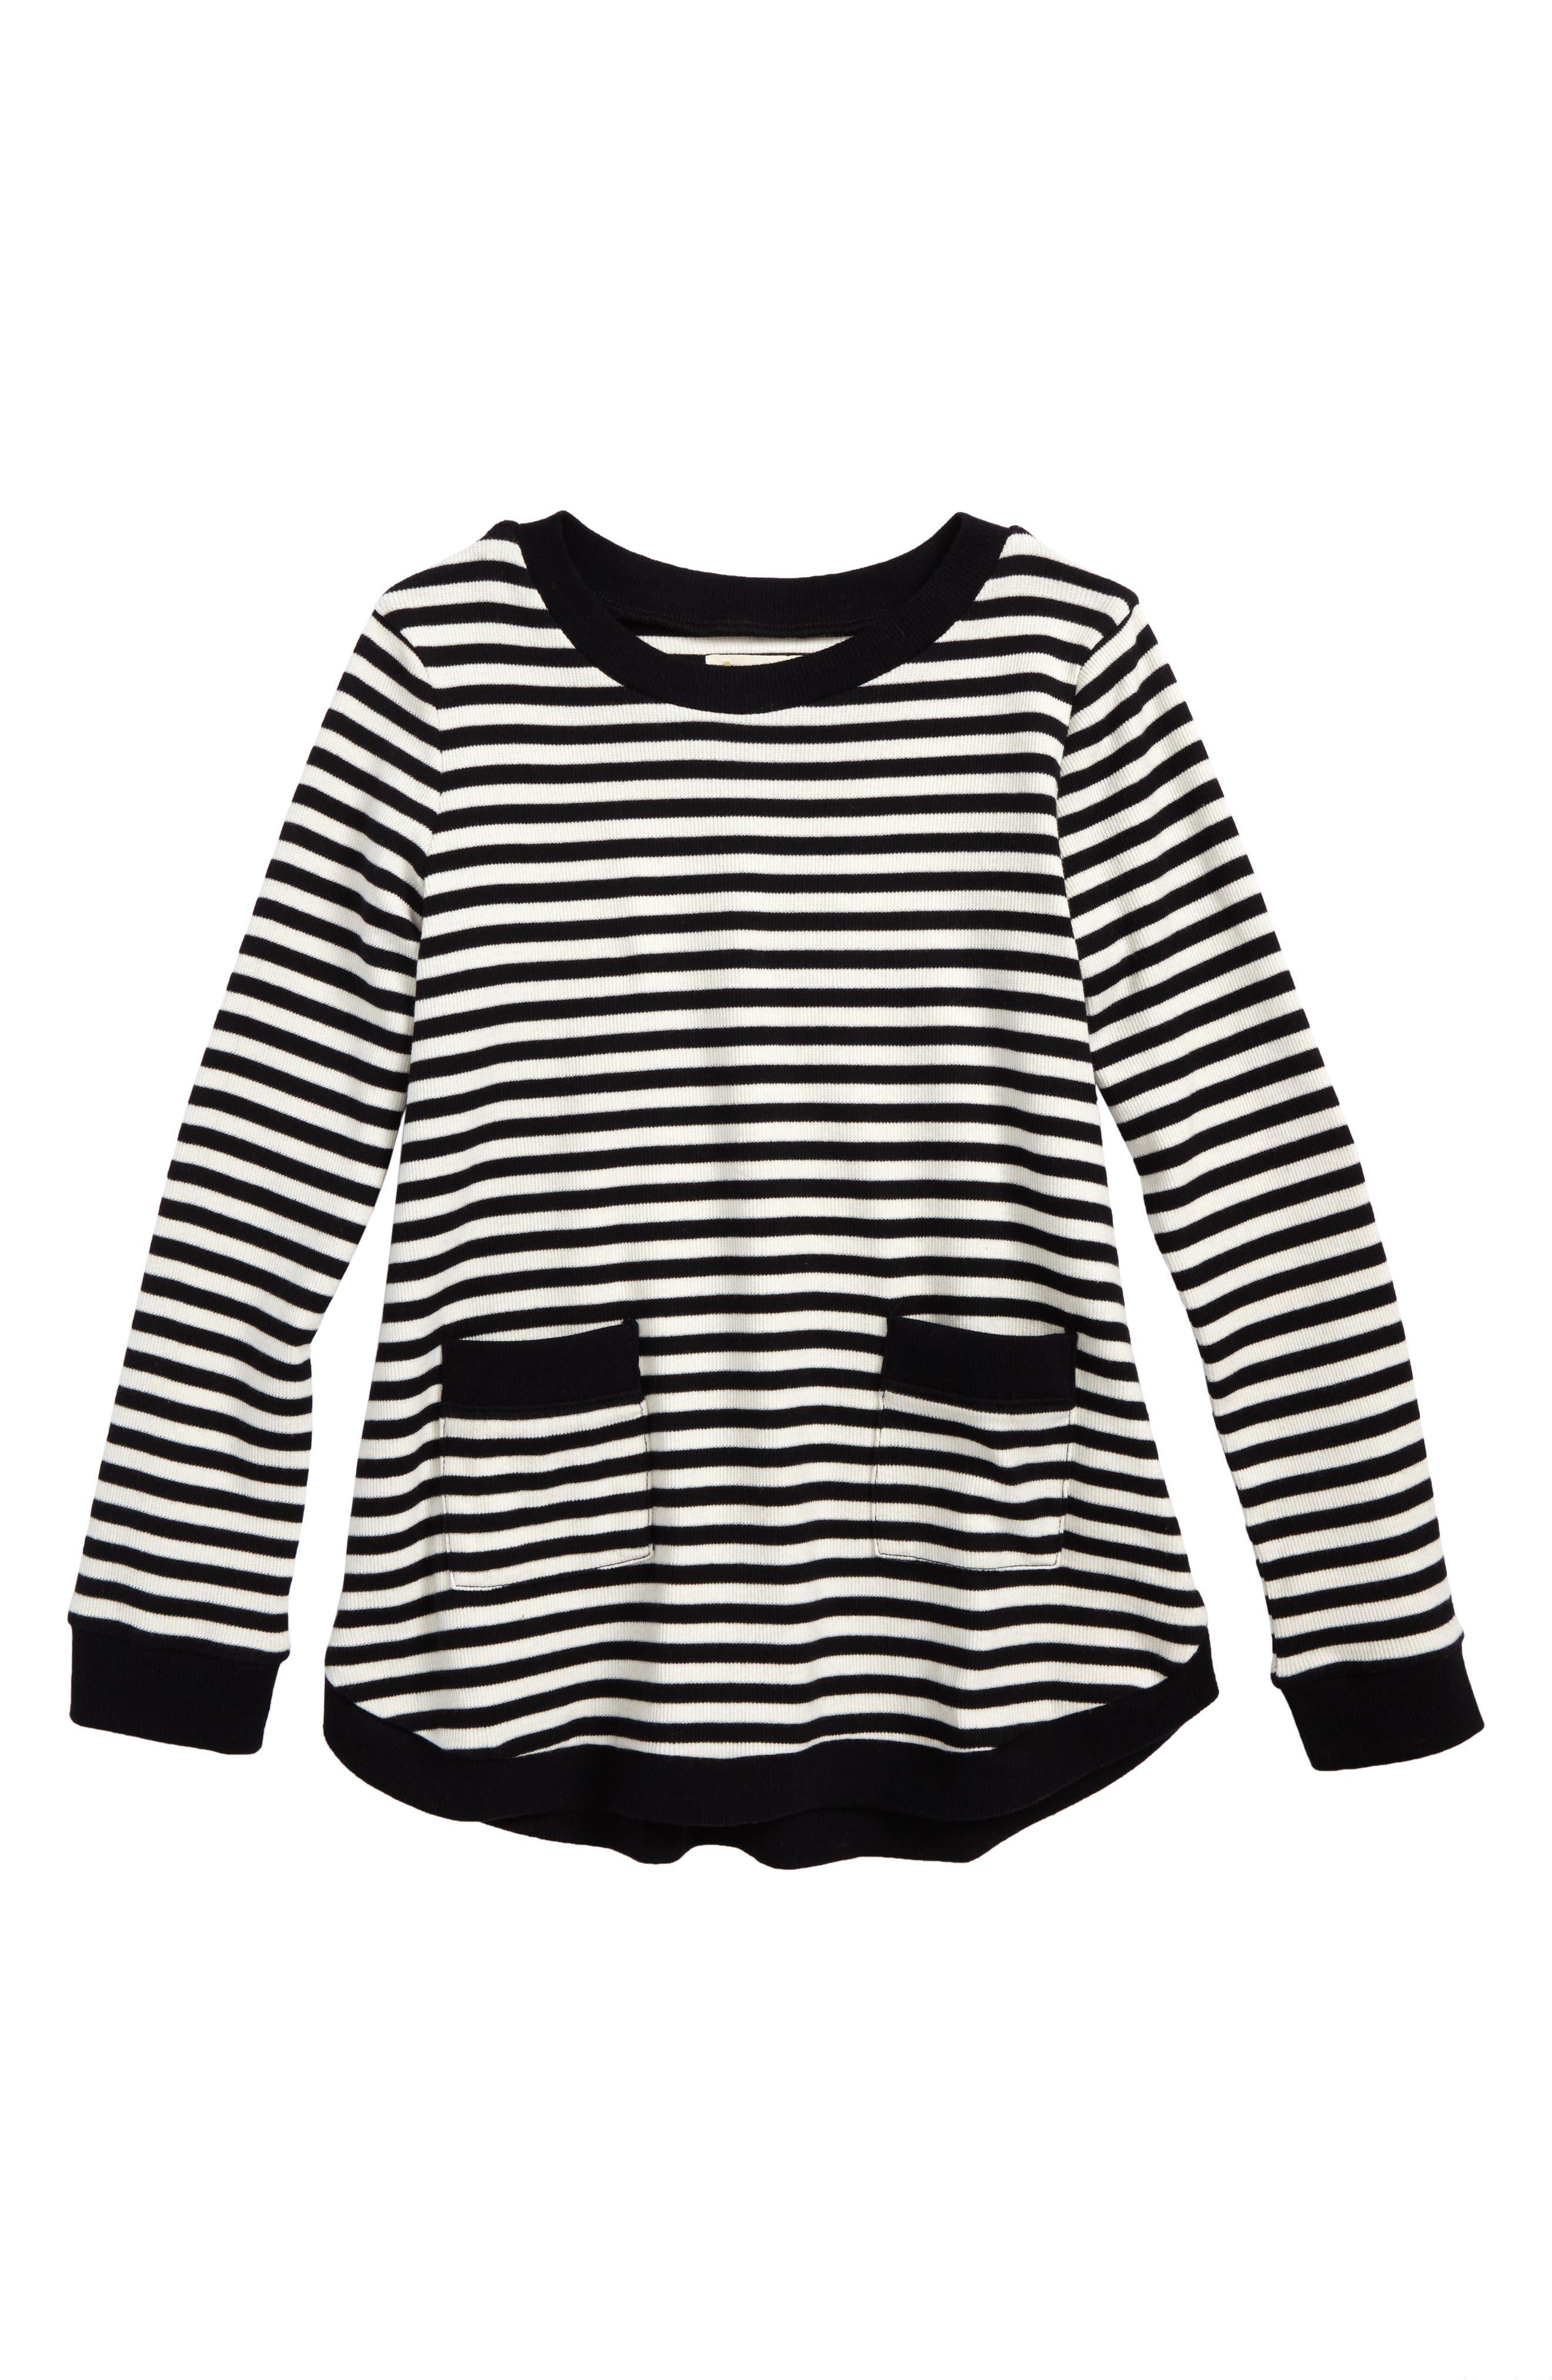 Heart Elbow Patch Stripe Tunic Top,                         Main,                         color, Black Rock- Ivory Stripe